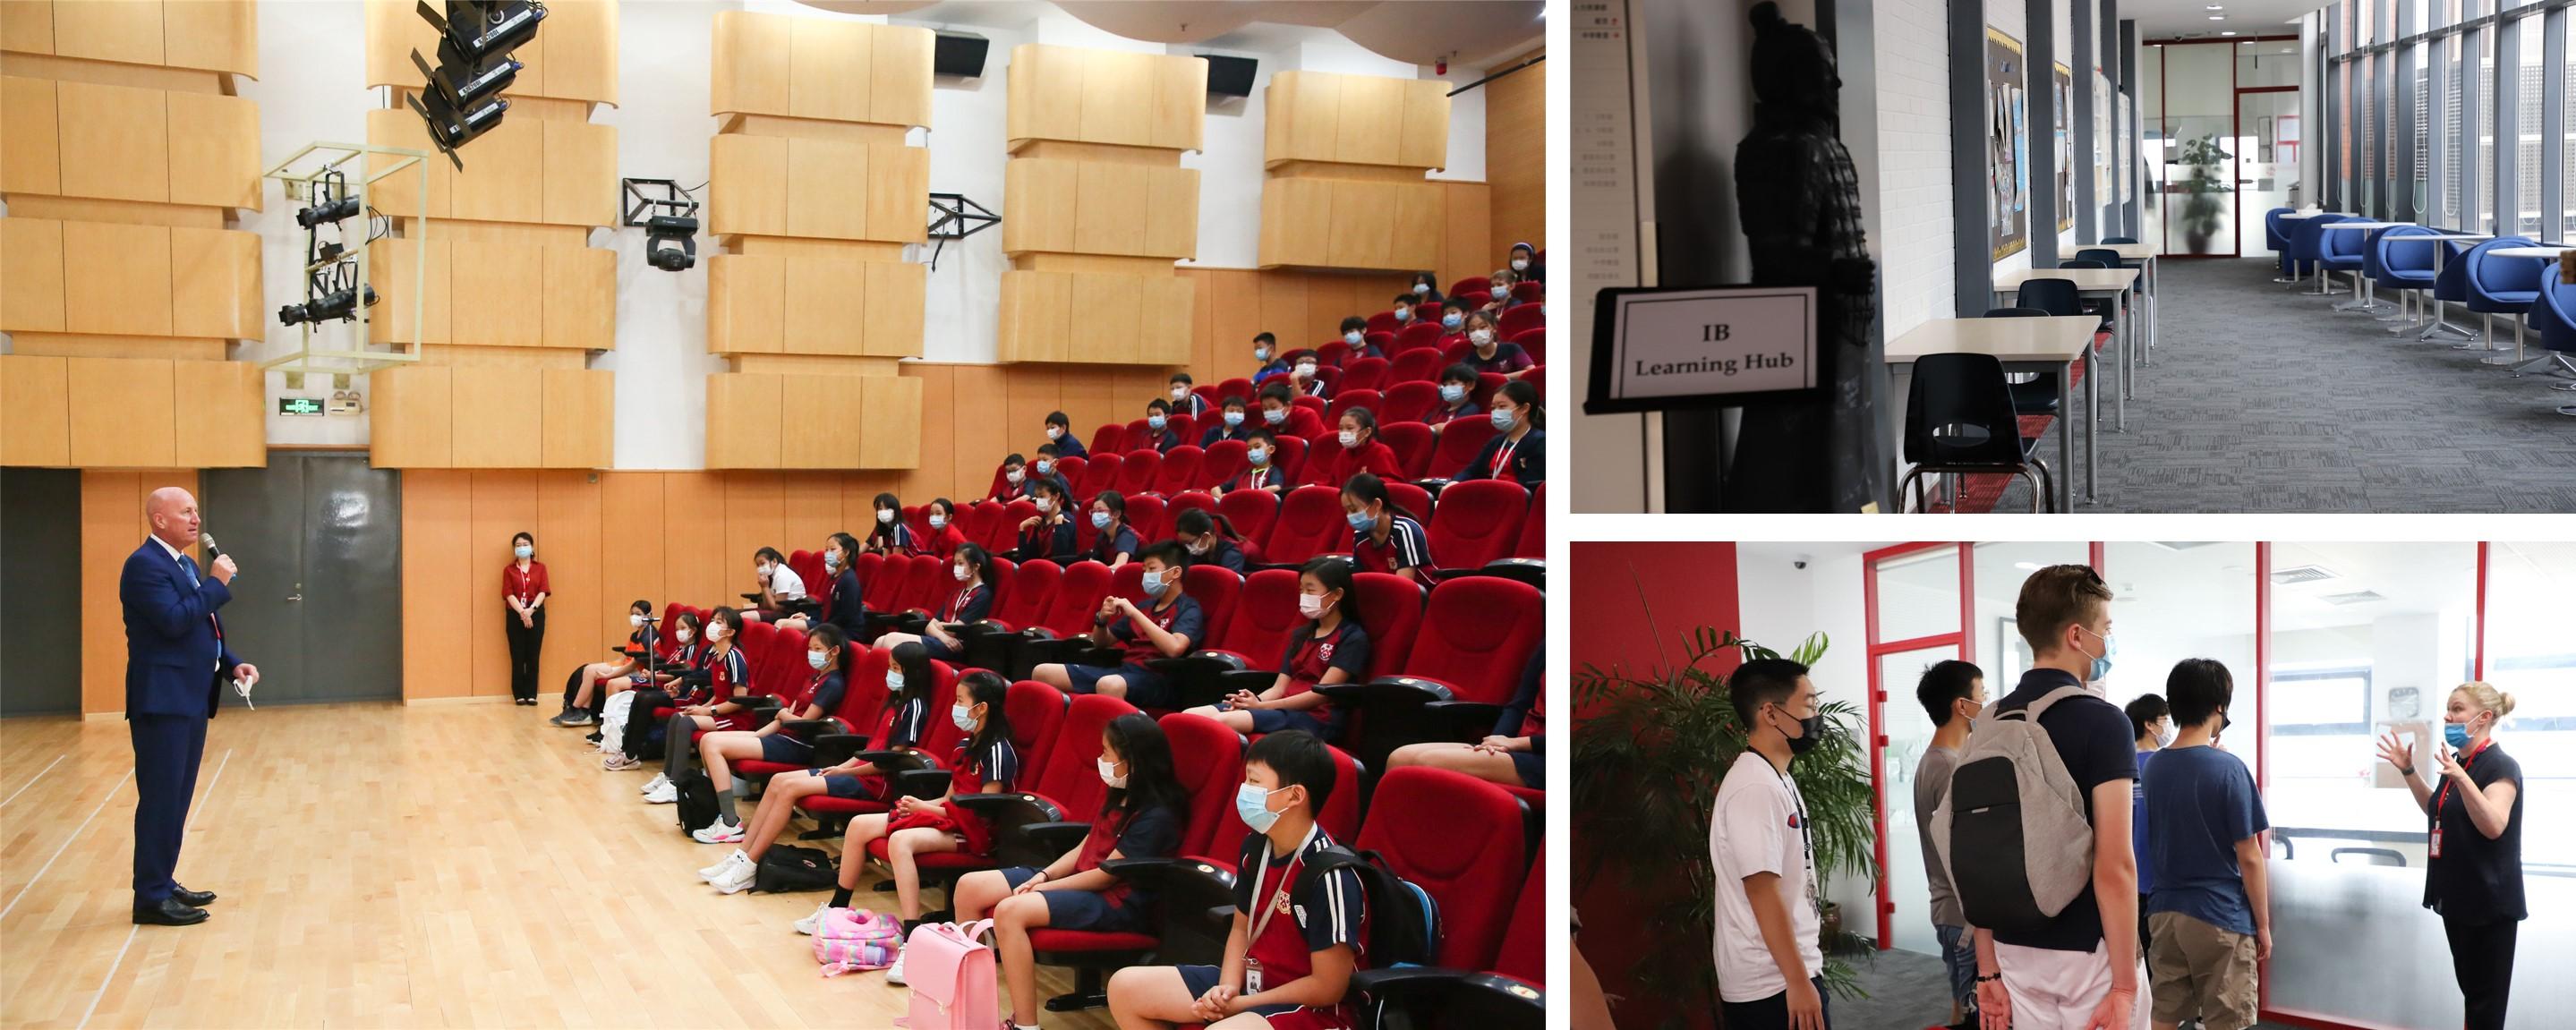 students-learning-北京德威英国国际学校-20200907-102726-708